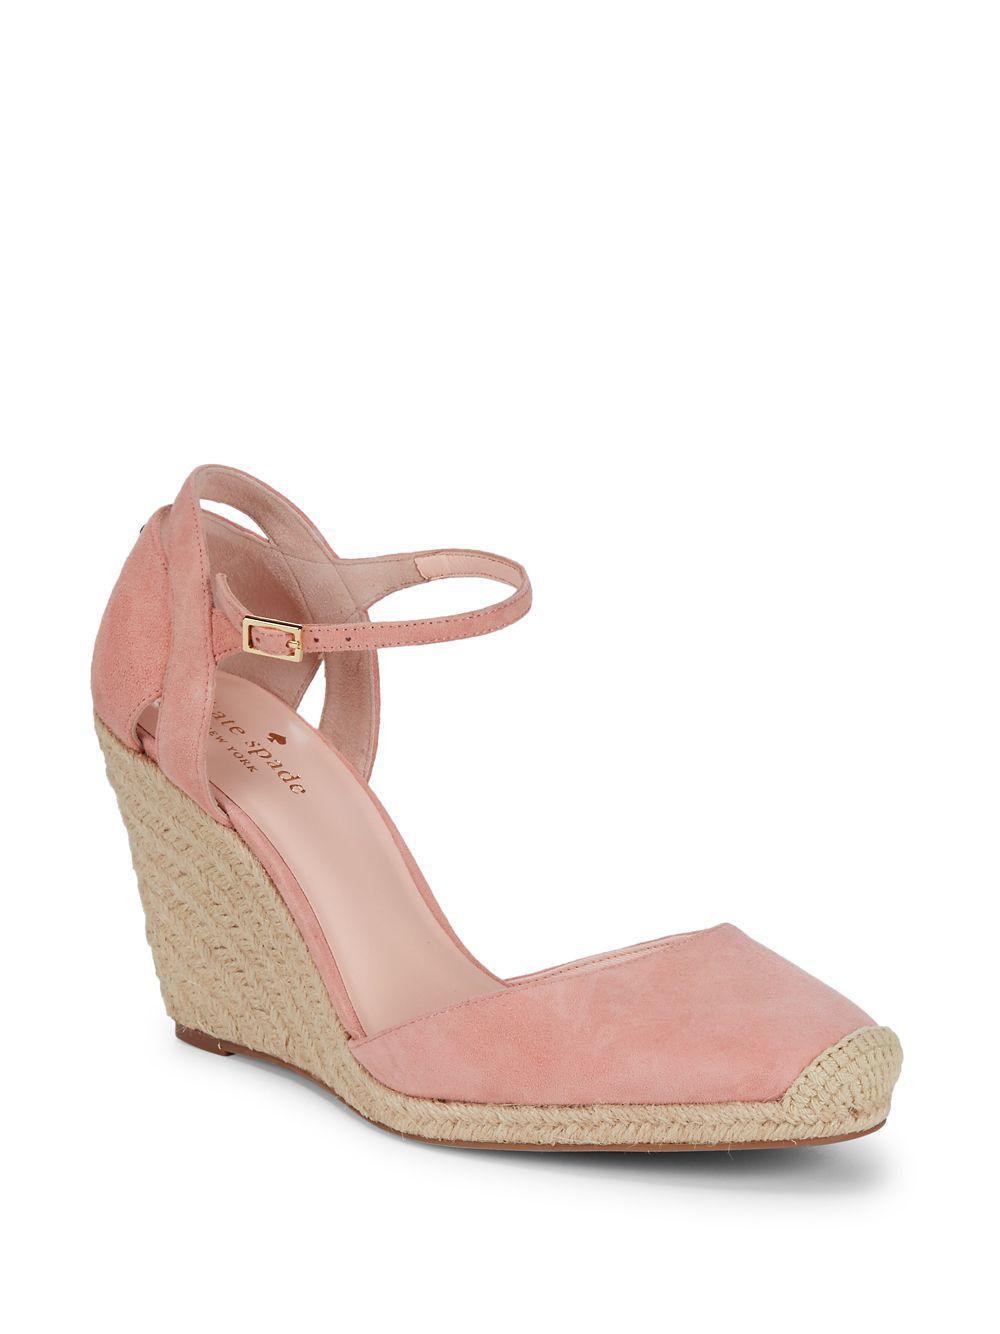 7e8f6b482bd Kate Spade Pink Giovanna Espadrille Wedge Sandals